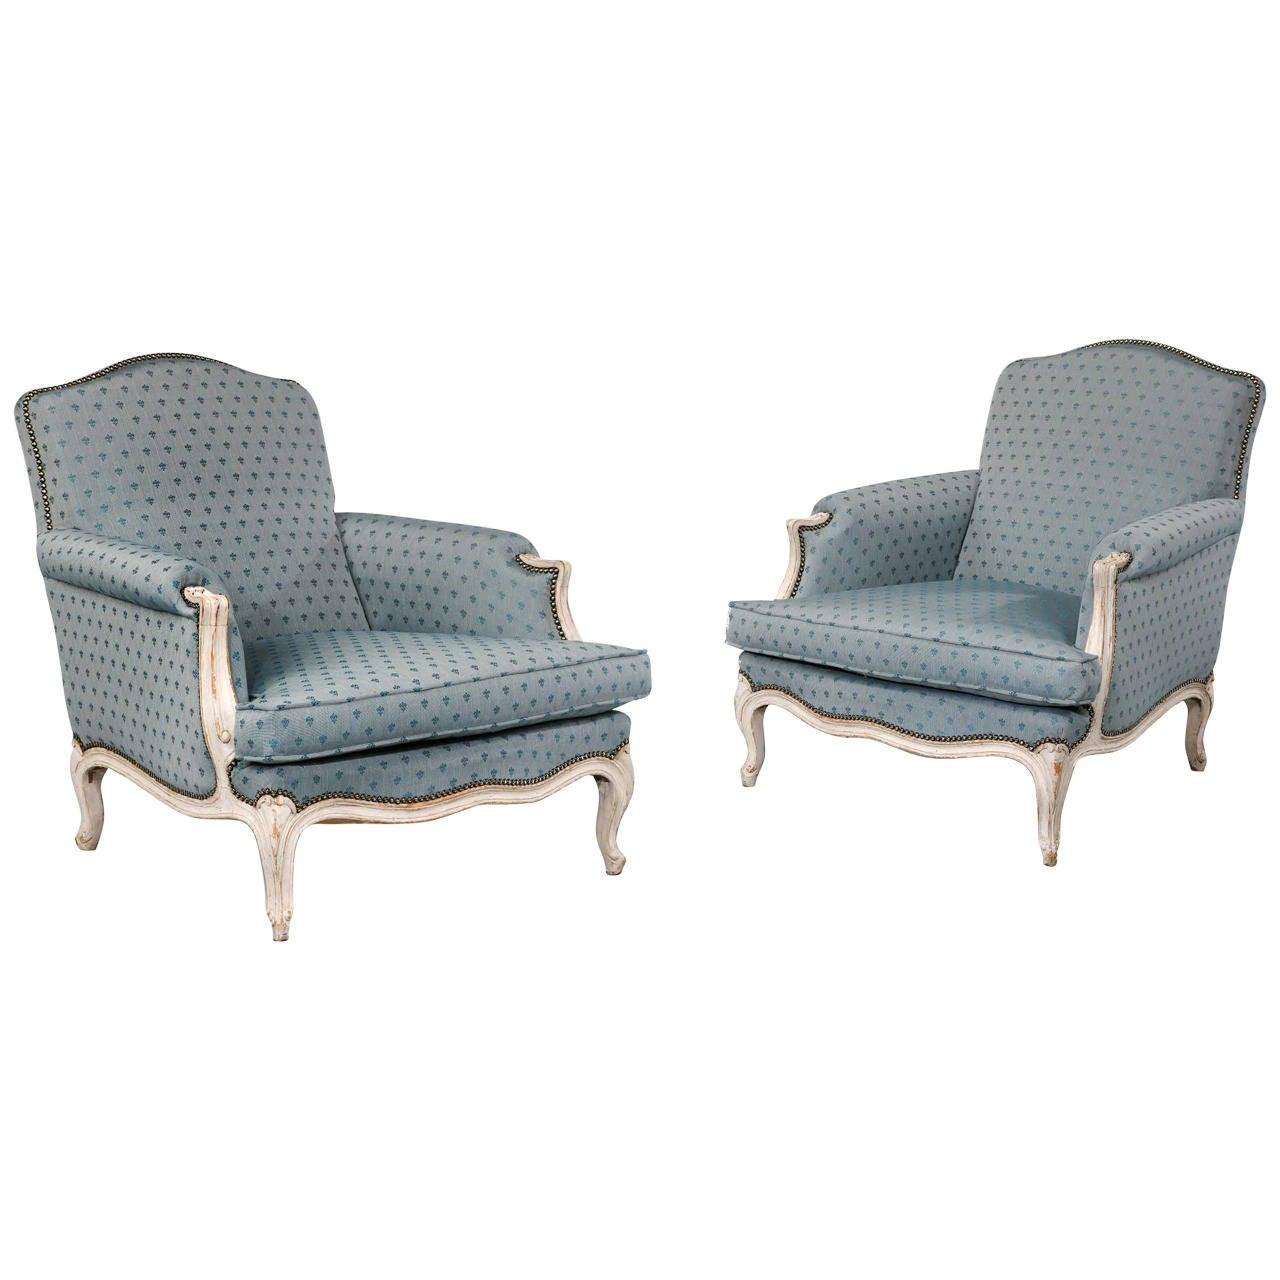 pair of louis xv design painted beech fauteuils for sale. Black Bedroom Furniture Sets. Home Design Ideas